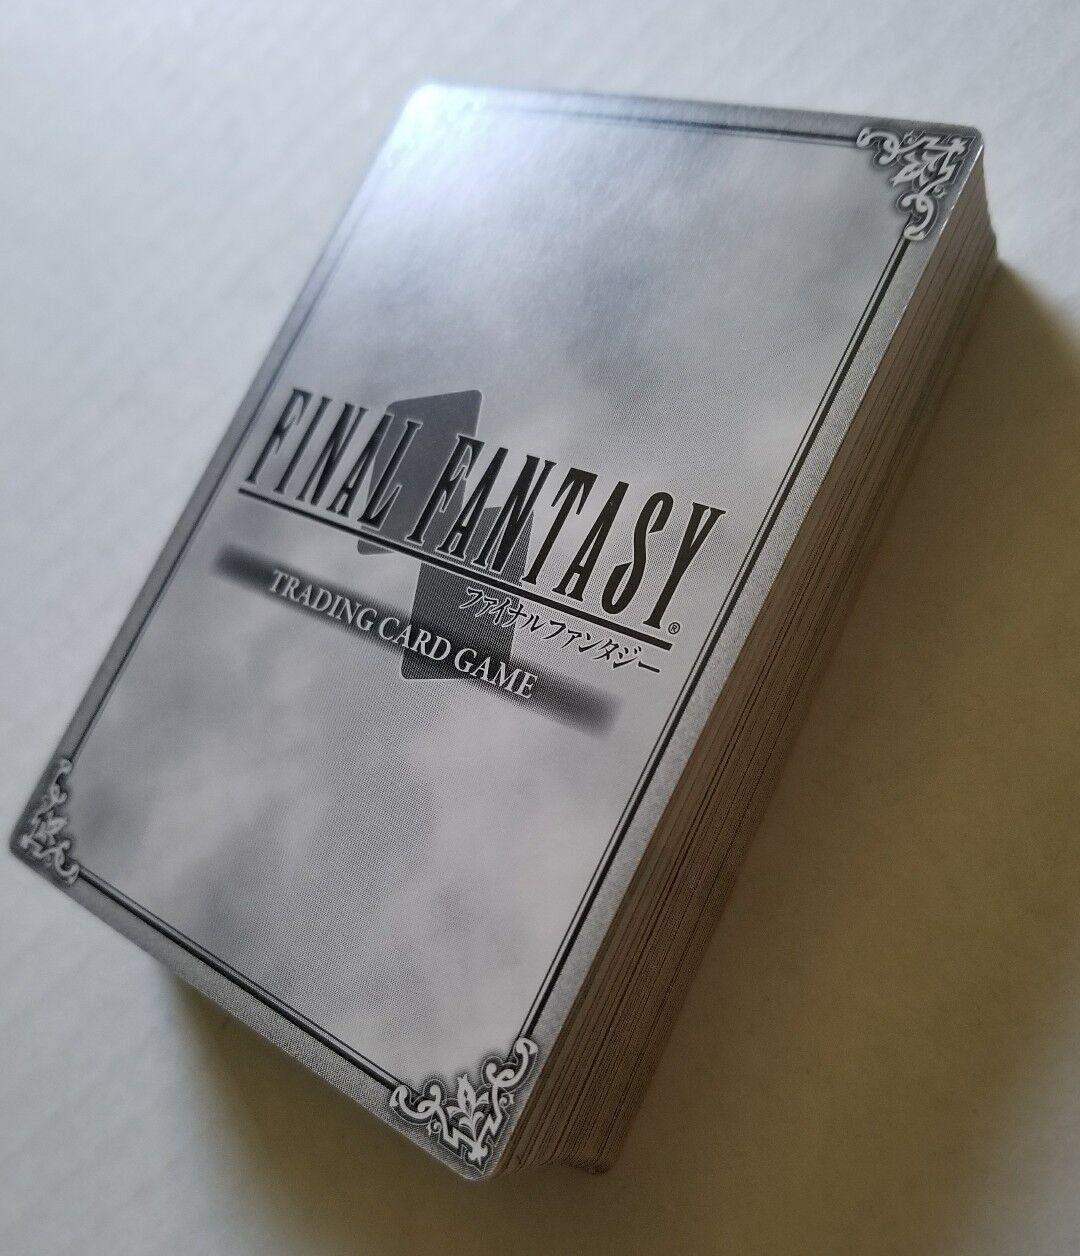 Japanese Final Fantasy Trading Card Game Entry Set Chapter II Lightning Deck